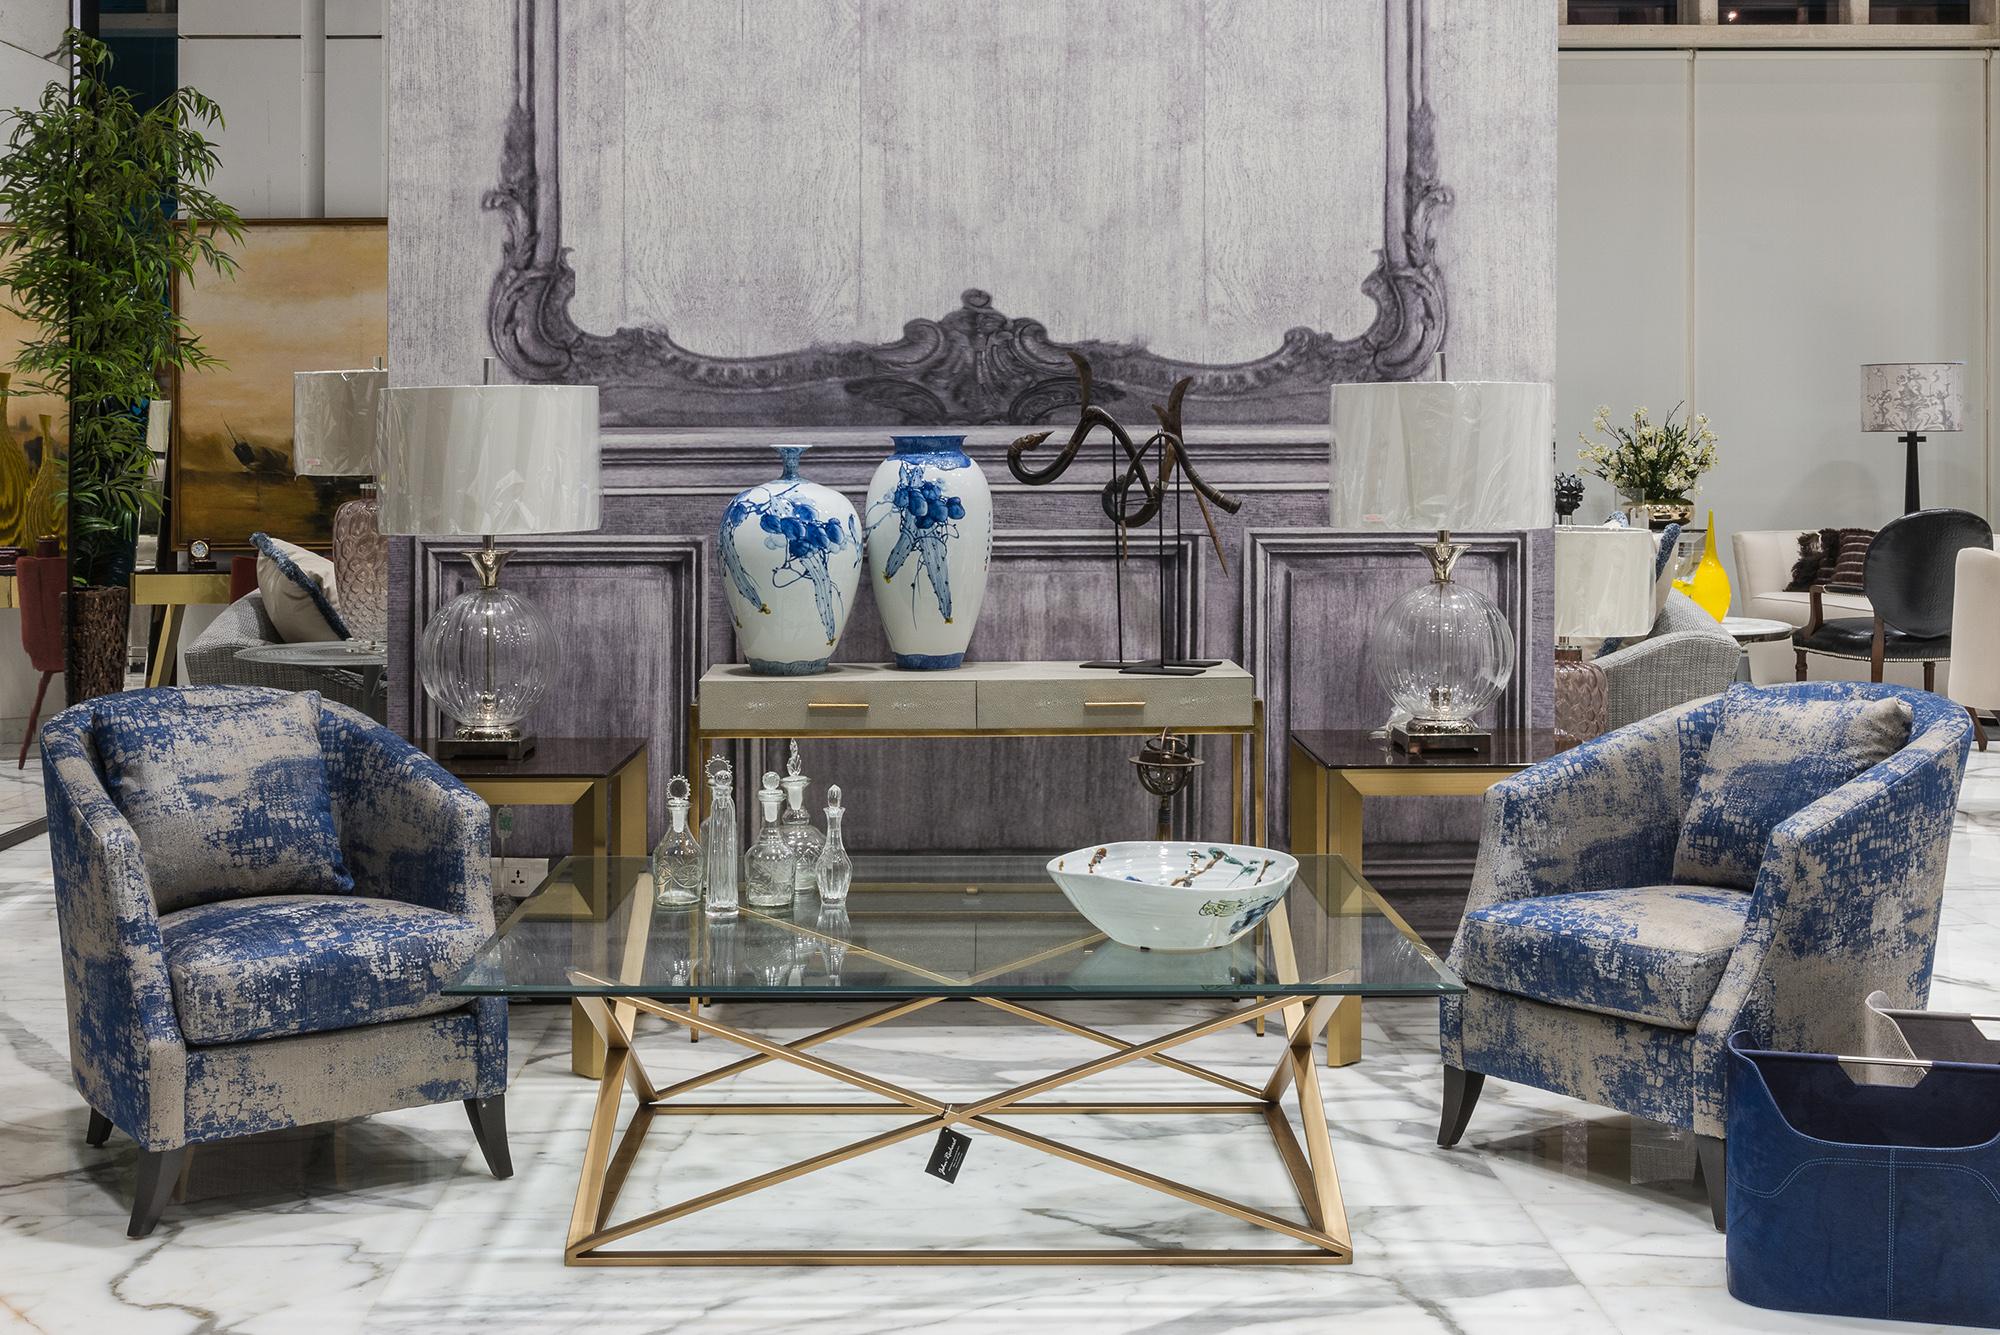 sofa set showroom in mumbai lena dunham maison by international furniture brands launches flagship